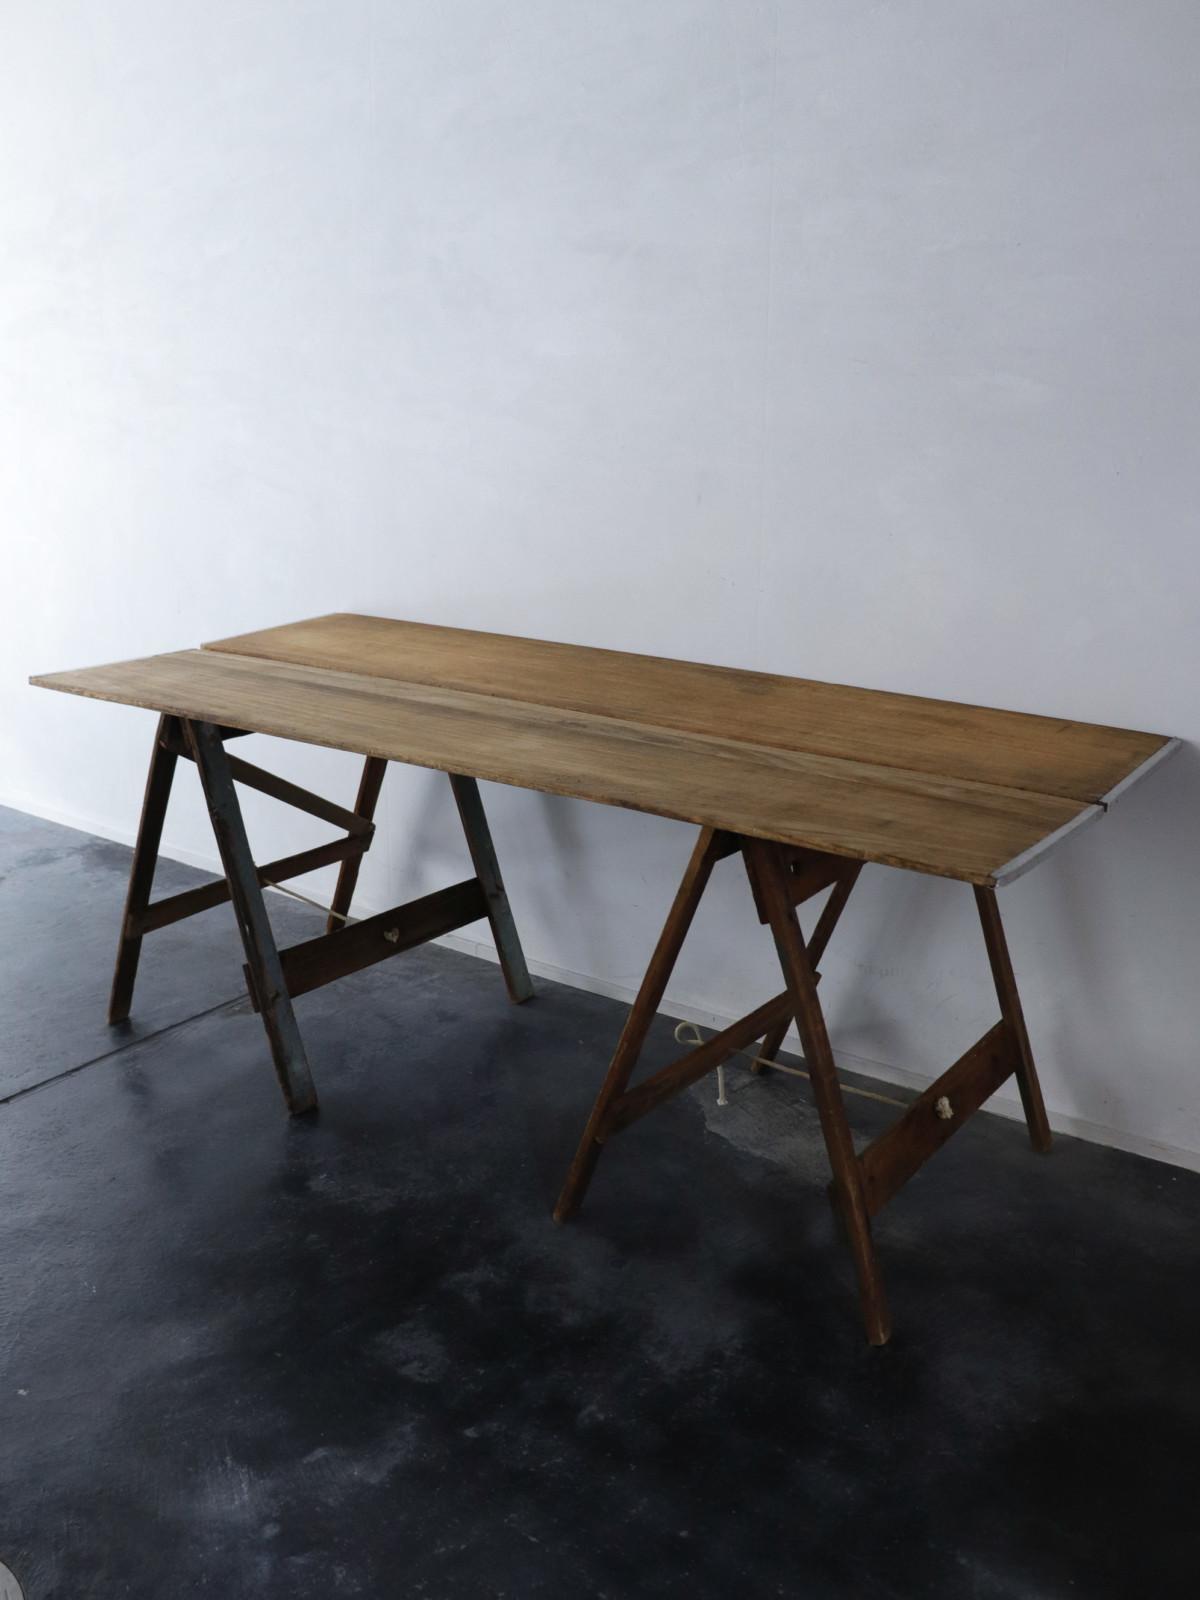 sawhorse,Vintage ,USA,folding,pine Wood plank